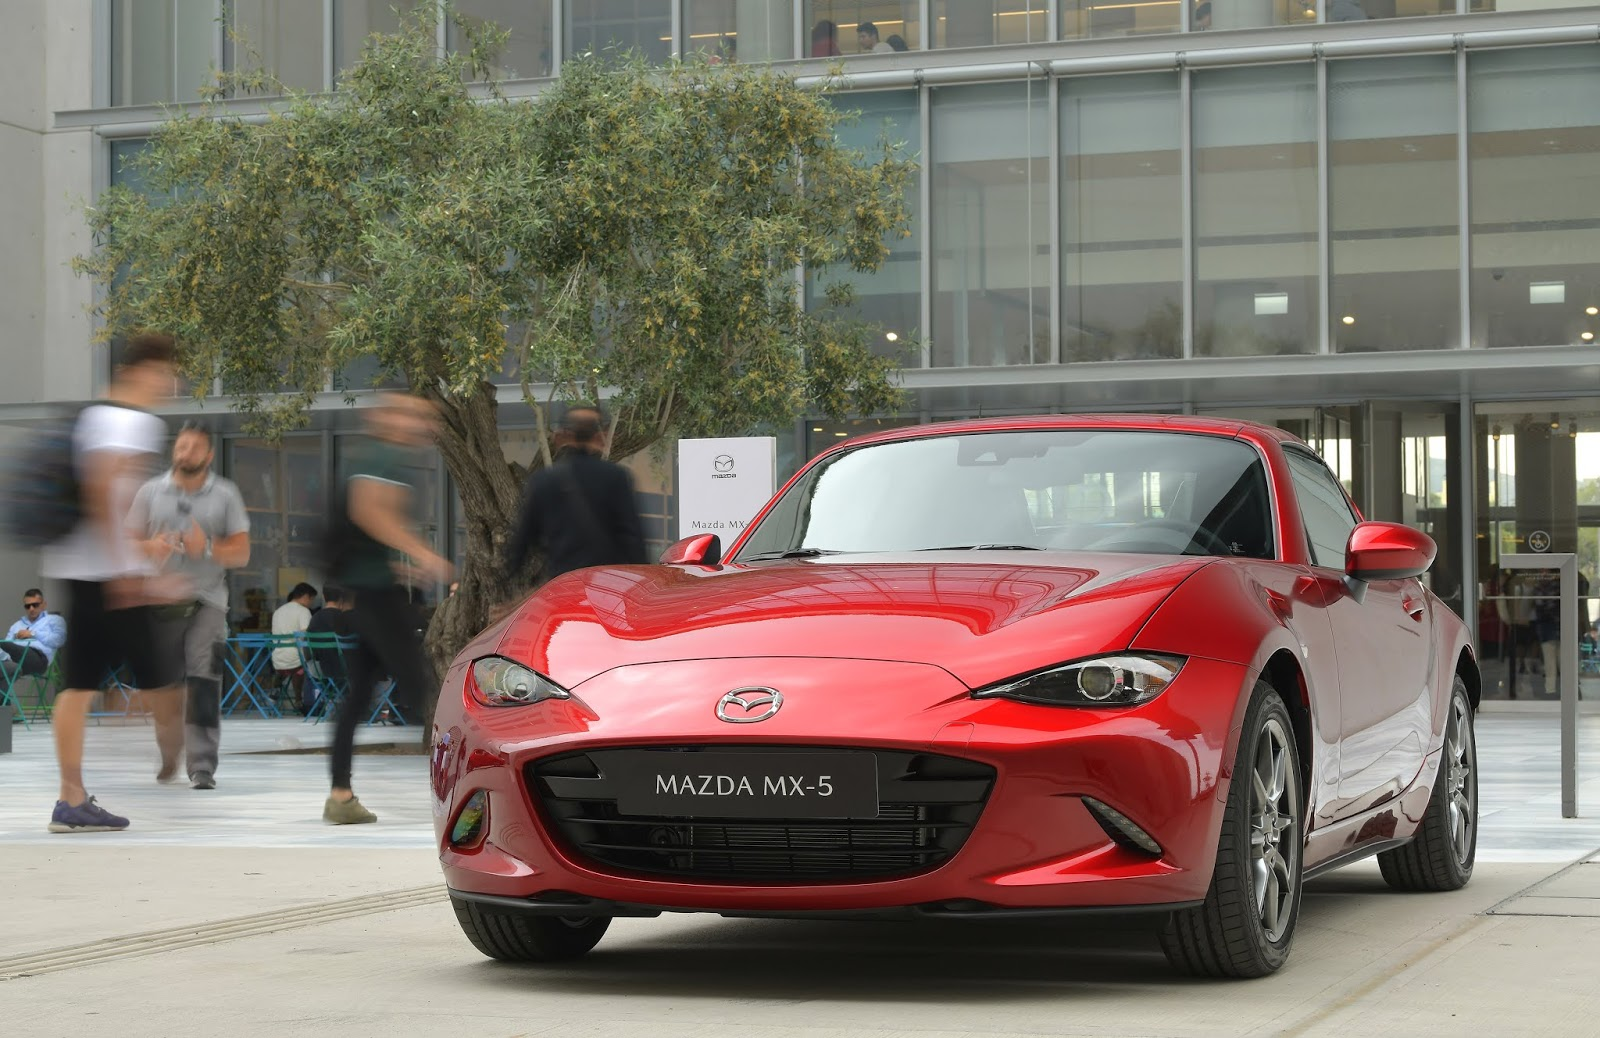 Mazda Greece 01 1 Στις 6 Ιουνίου τα εγκαίνια της πρώτης έκθεσης Mazda στην Ελλάδα